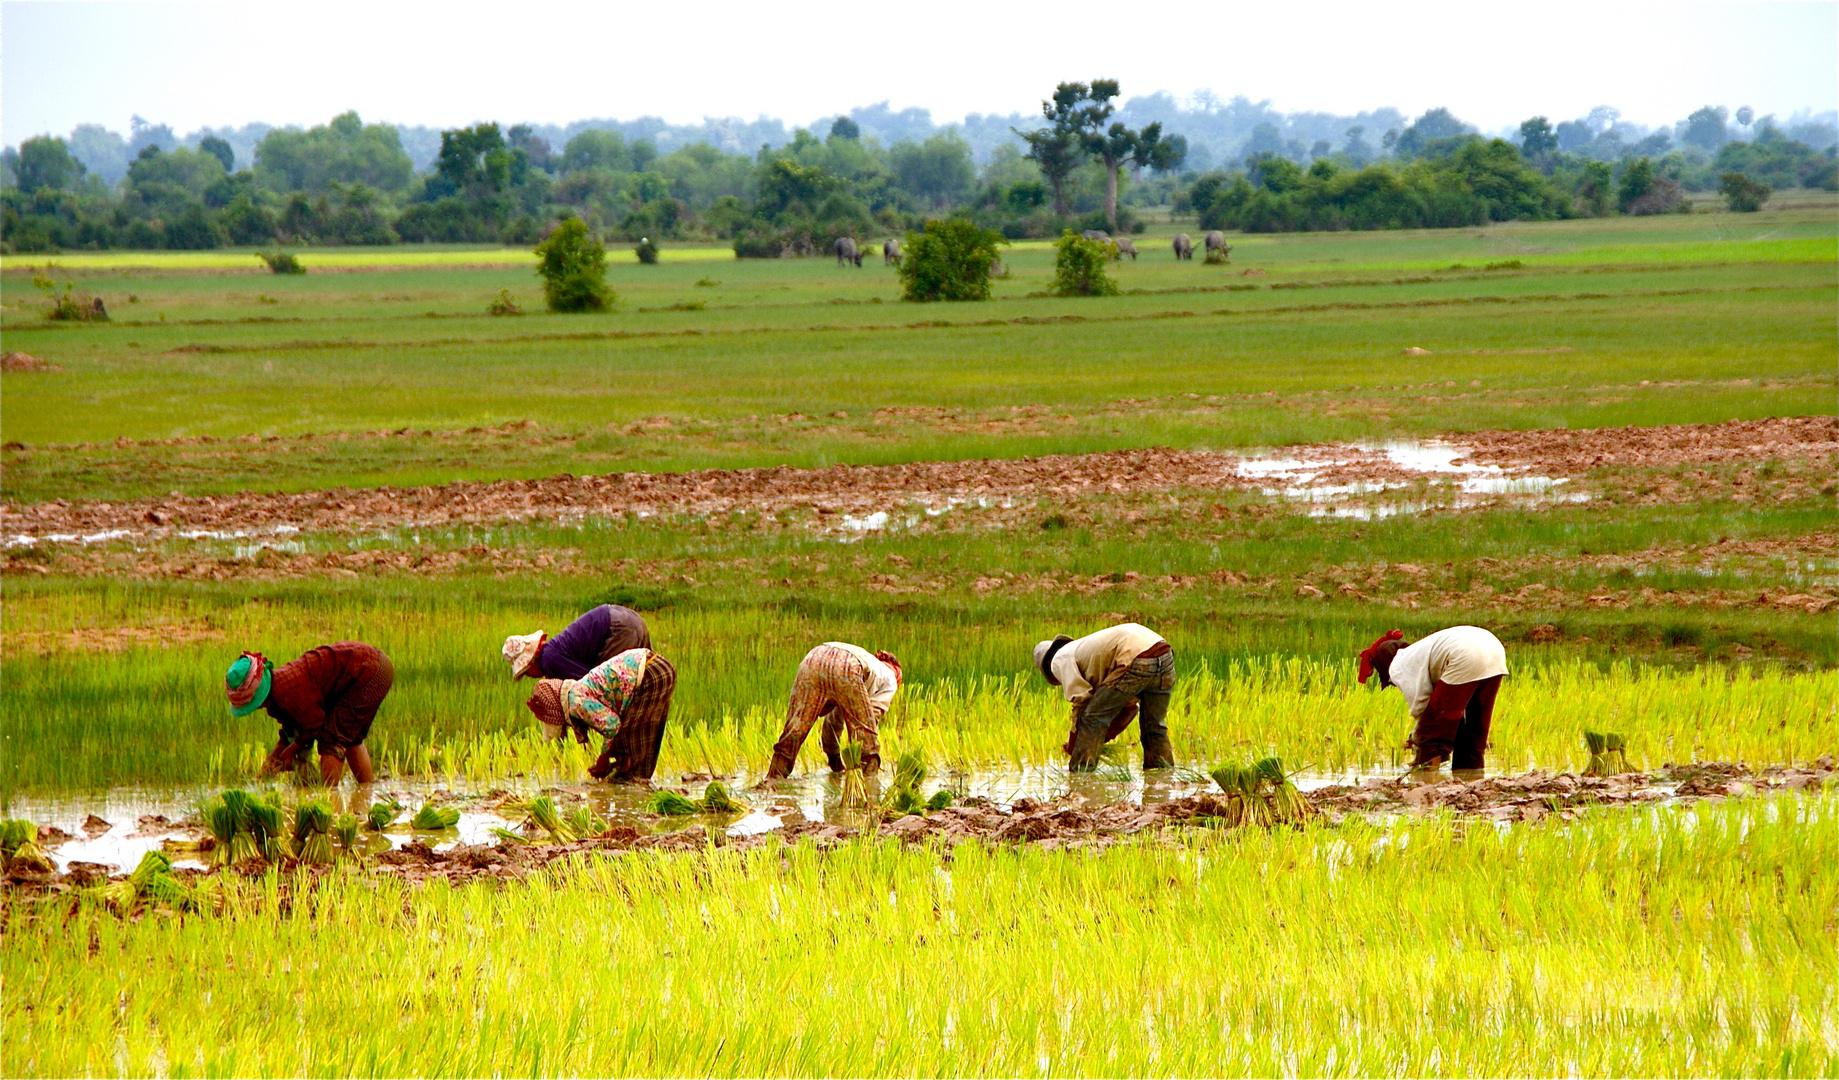 farben im reisfeld, cambodia 2010